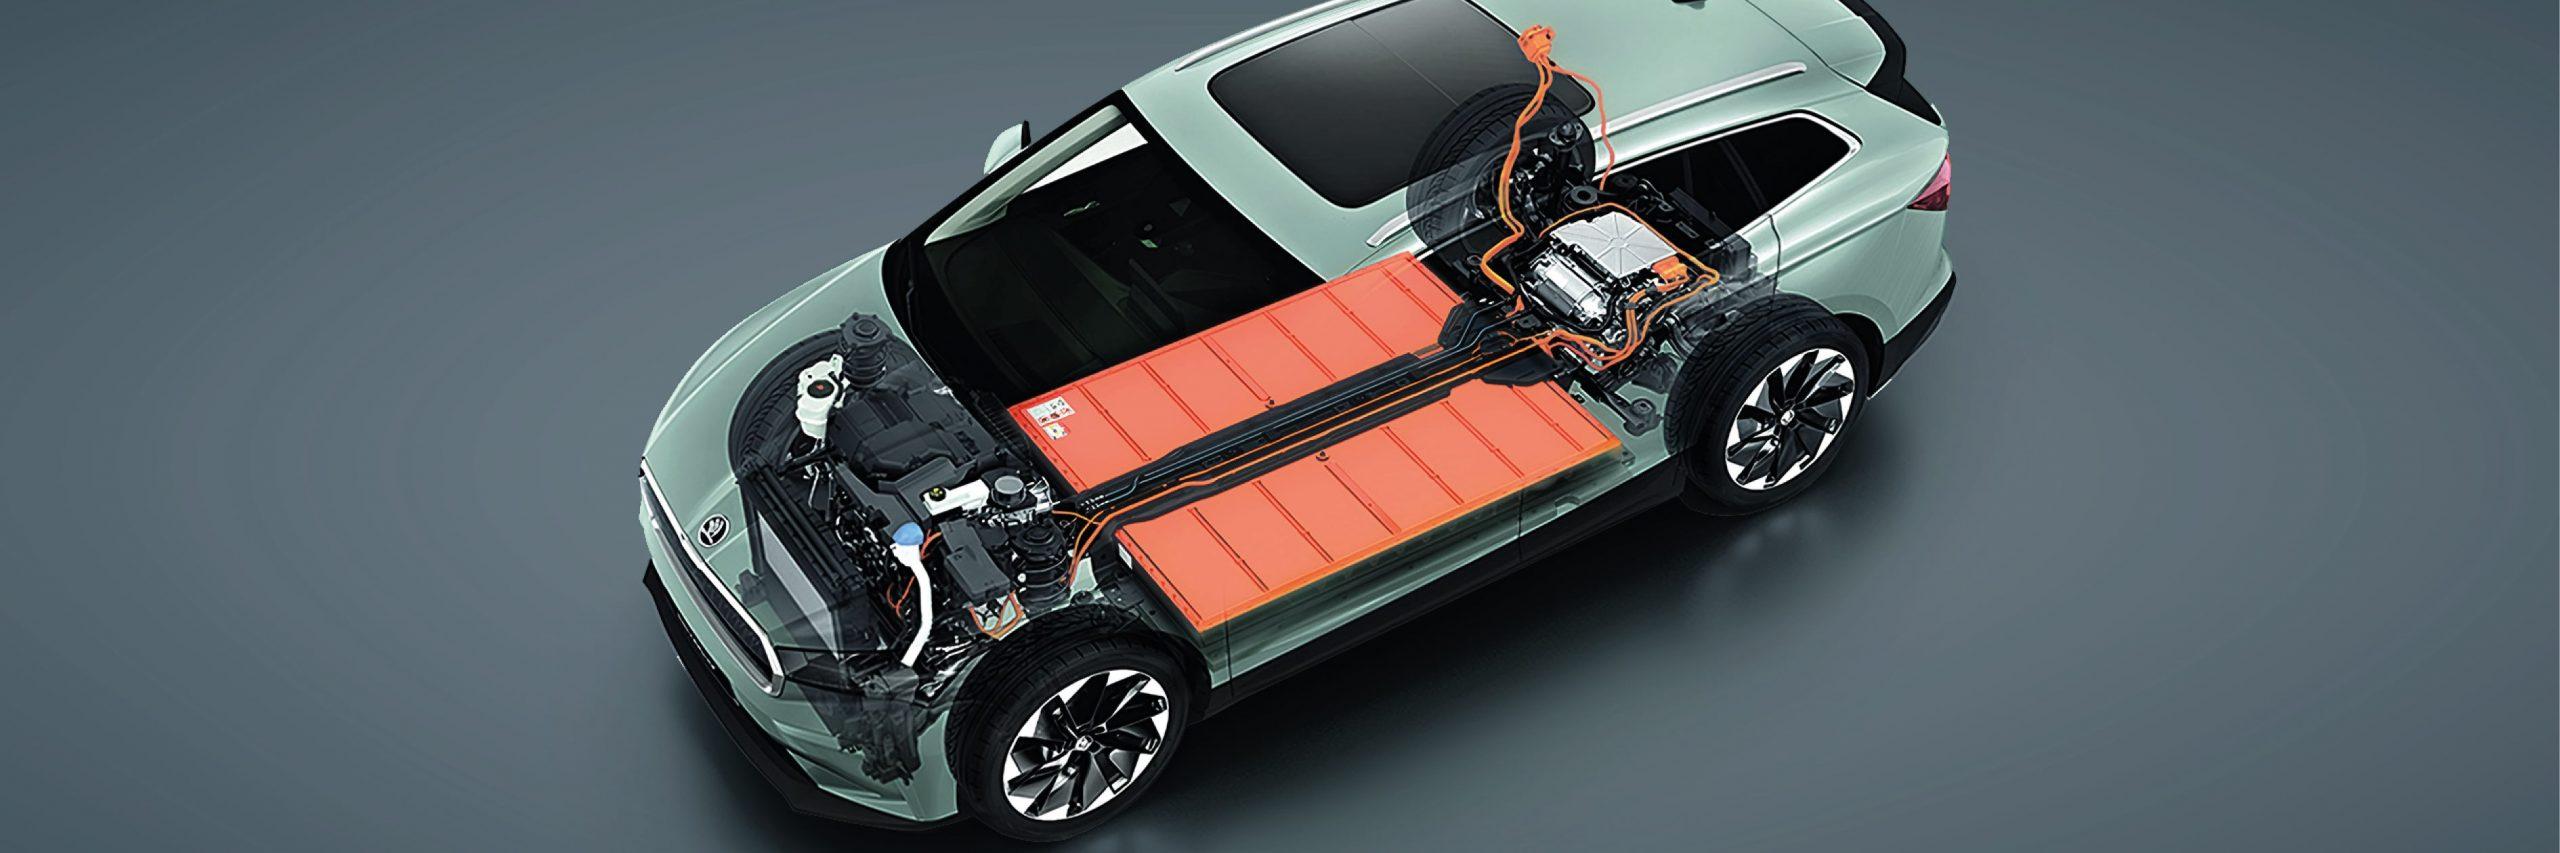 siguranta masini electrice